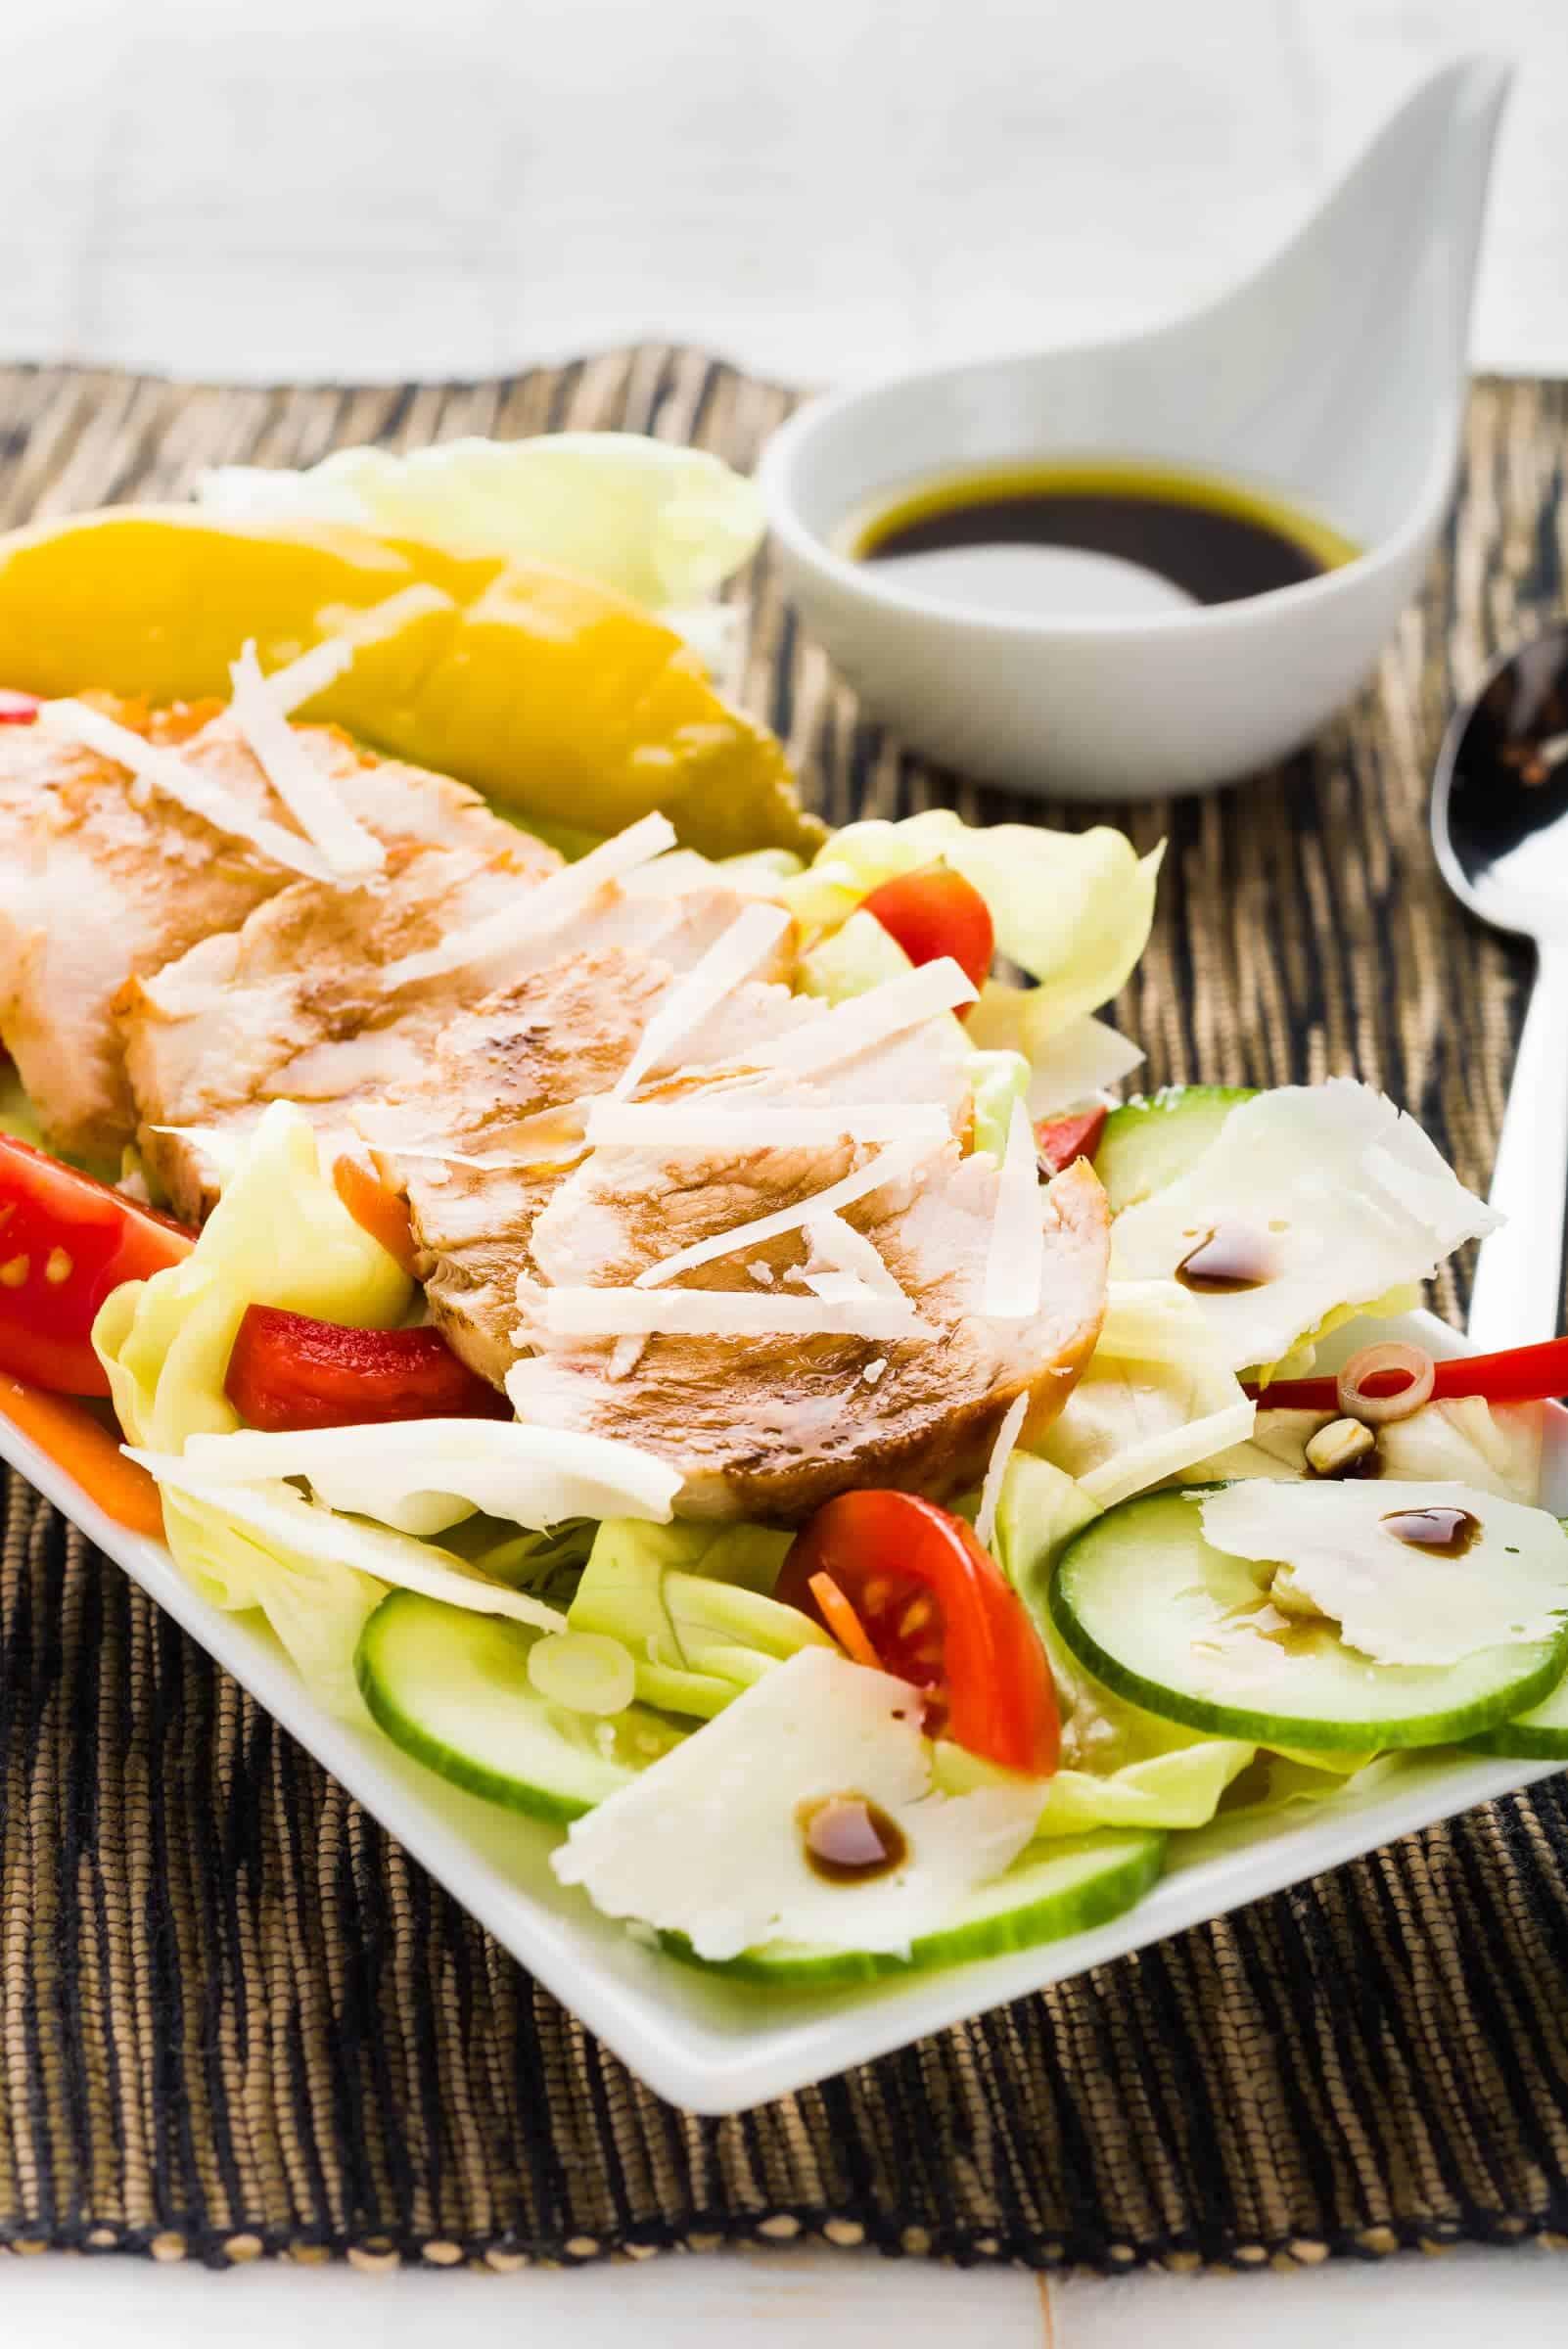 Caesar Salad o Insalata di pollo Hero ricetta GnamAm.com